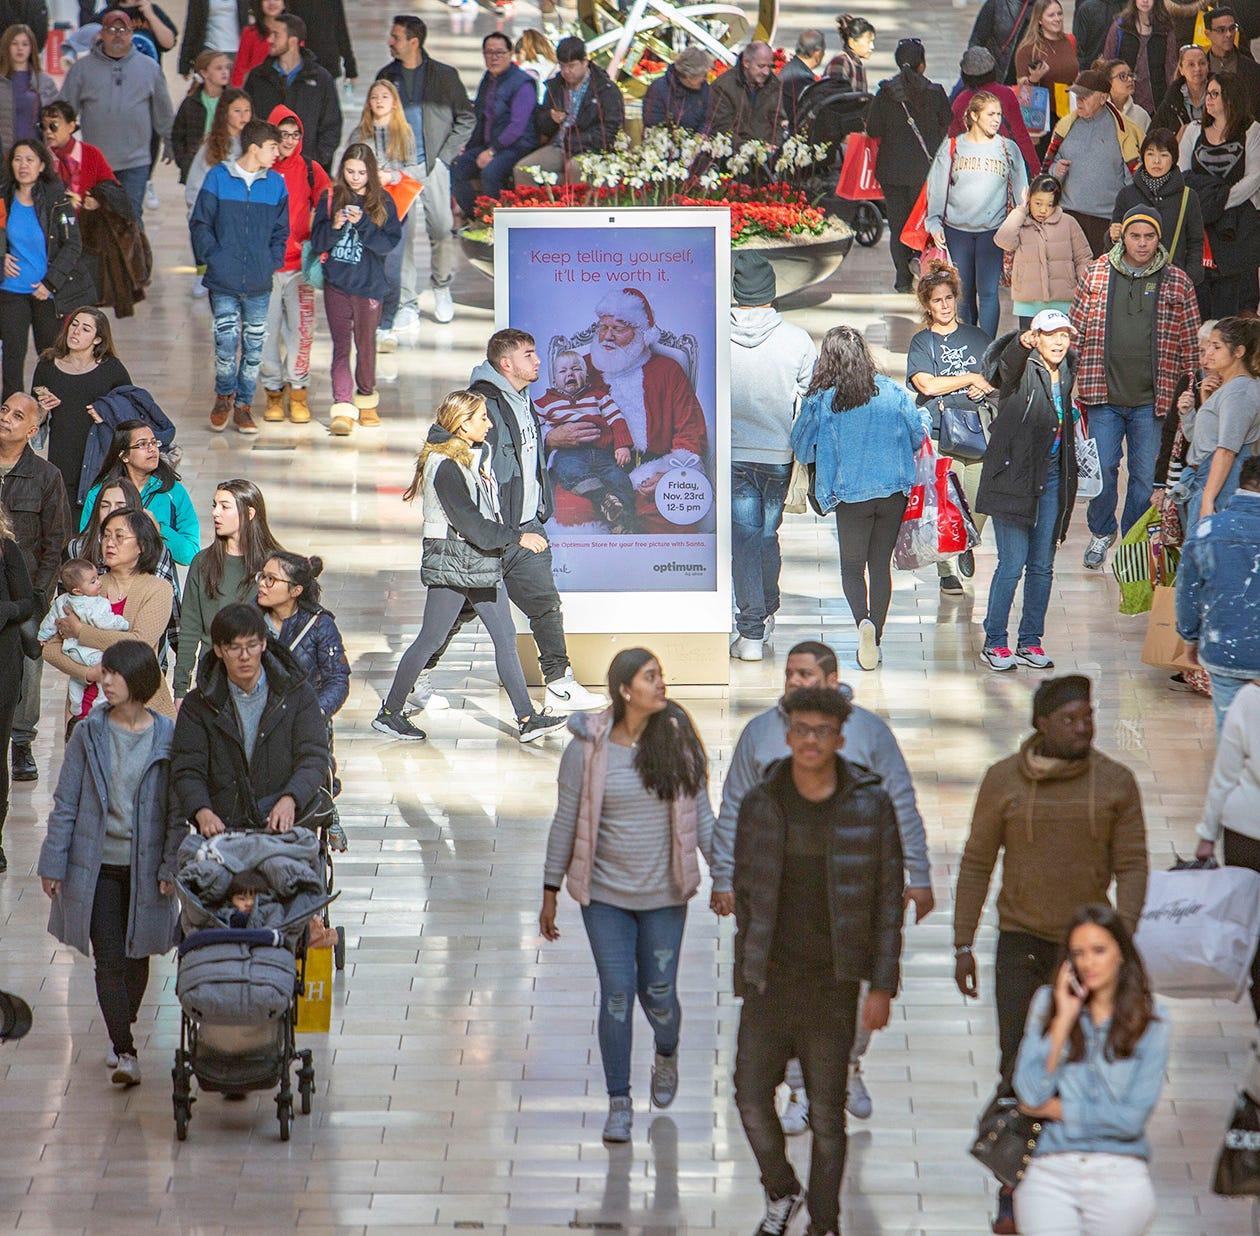 Black Friday scorecard: More spending online, fewer shoppers in stores